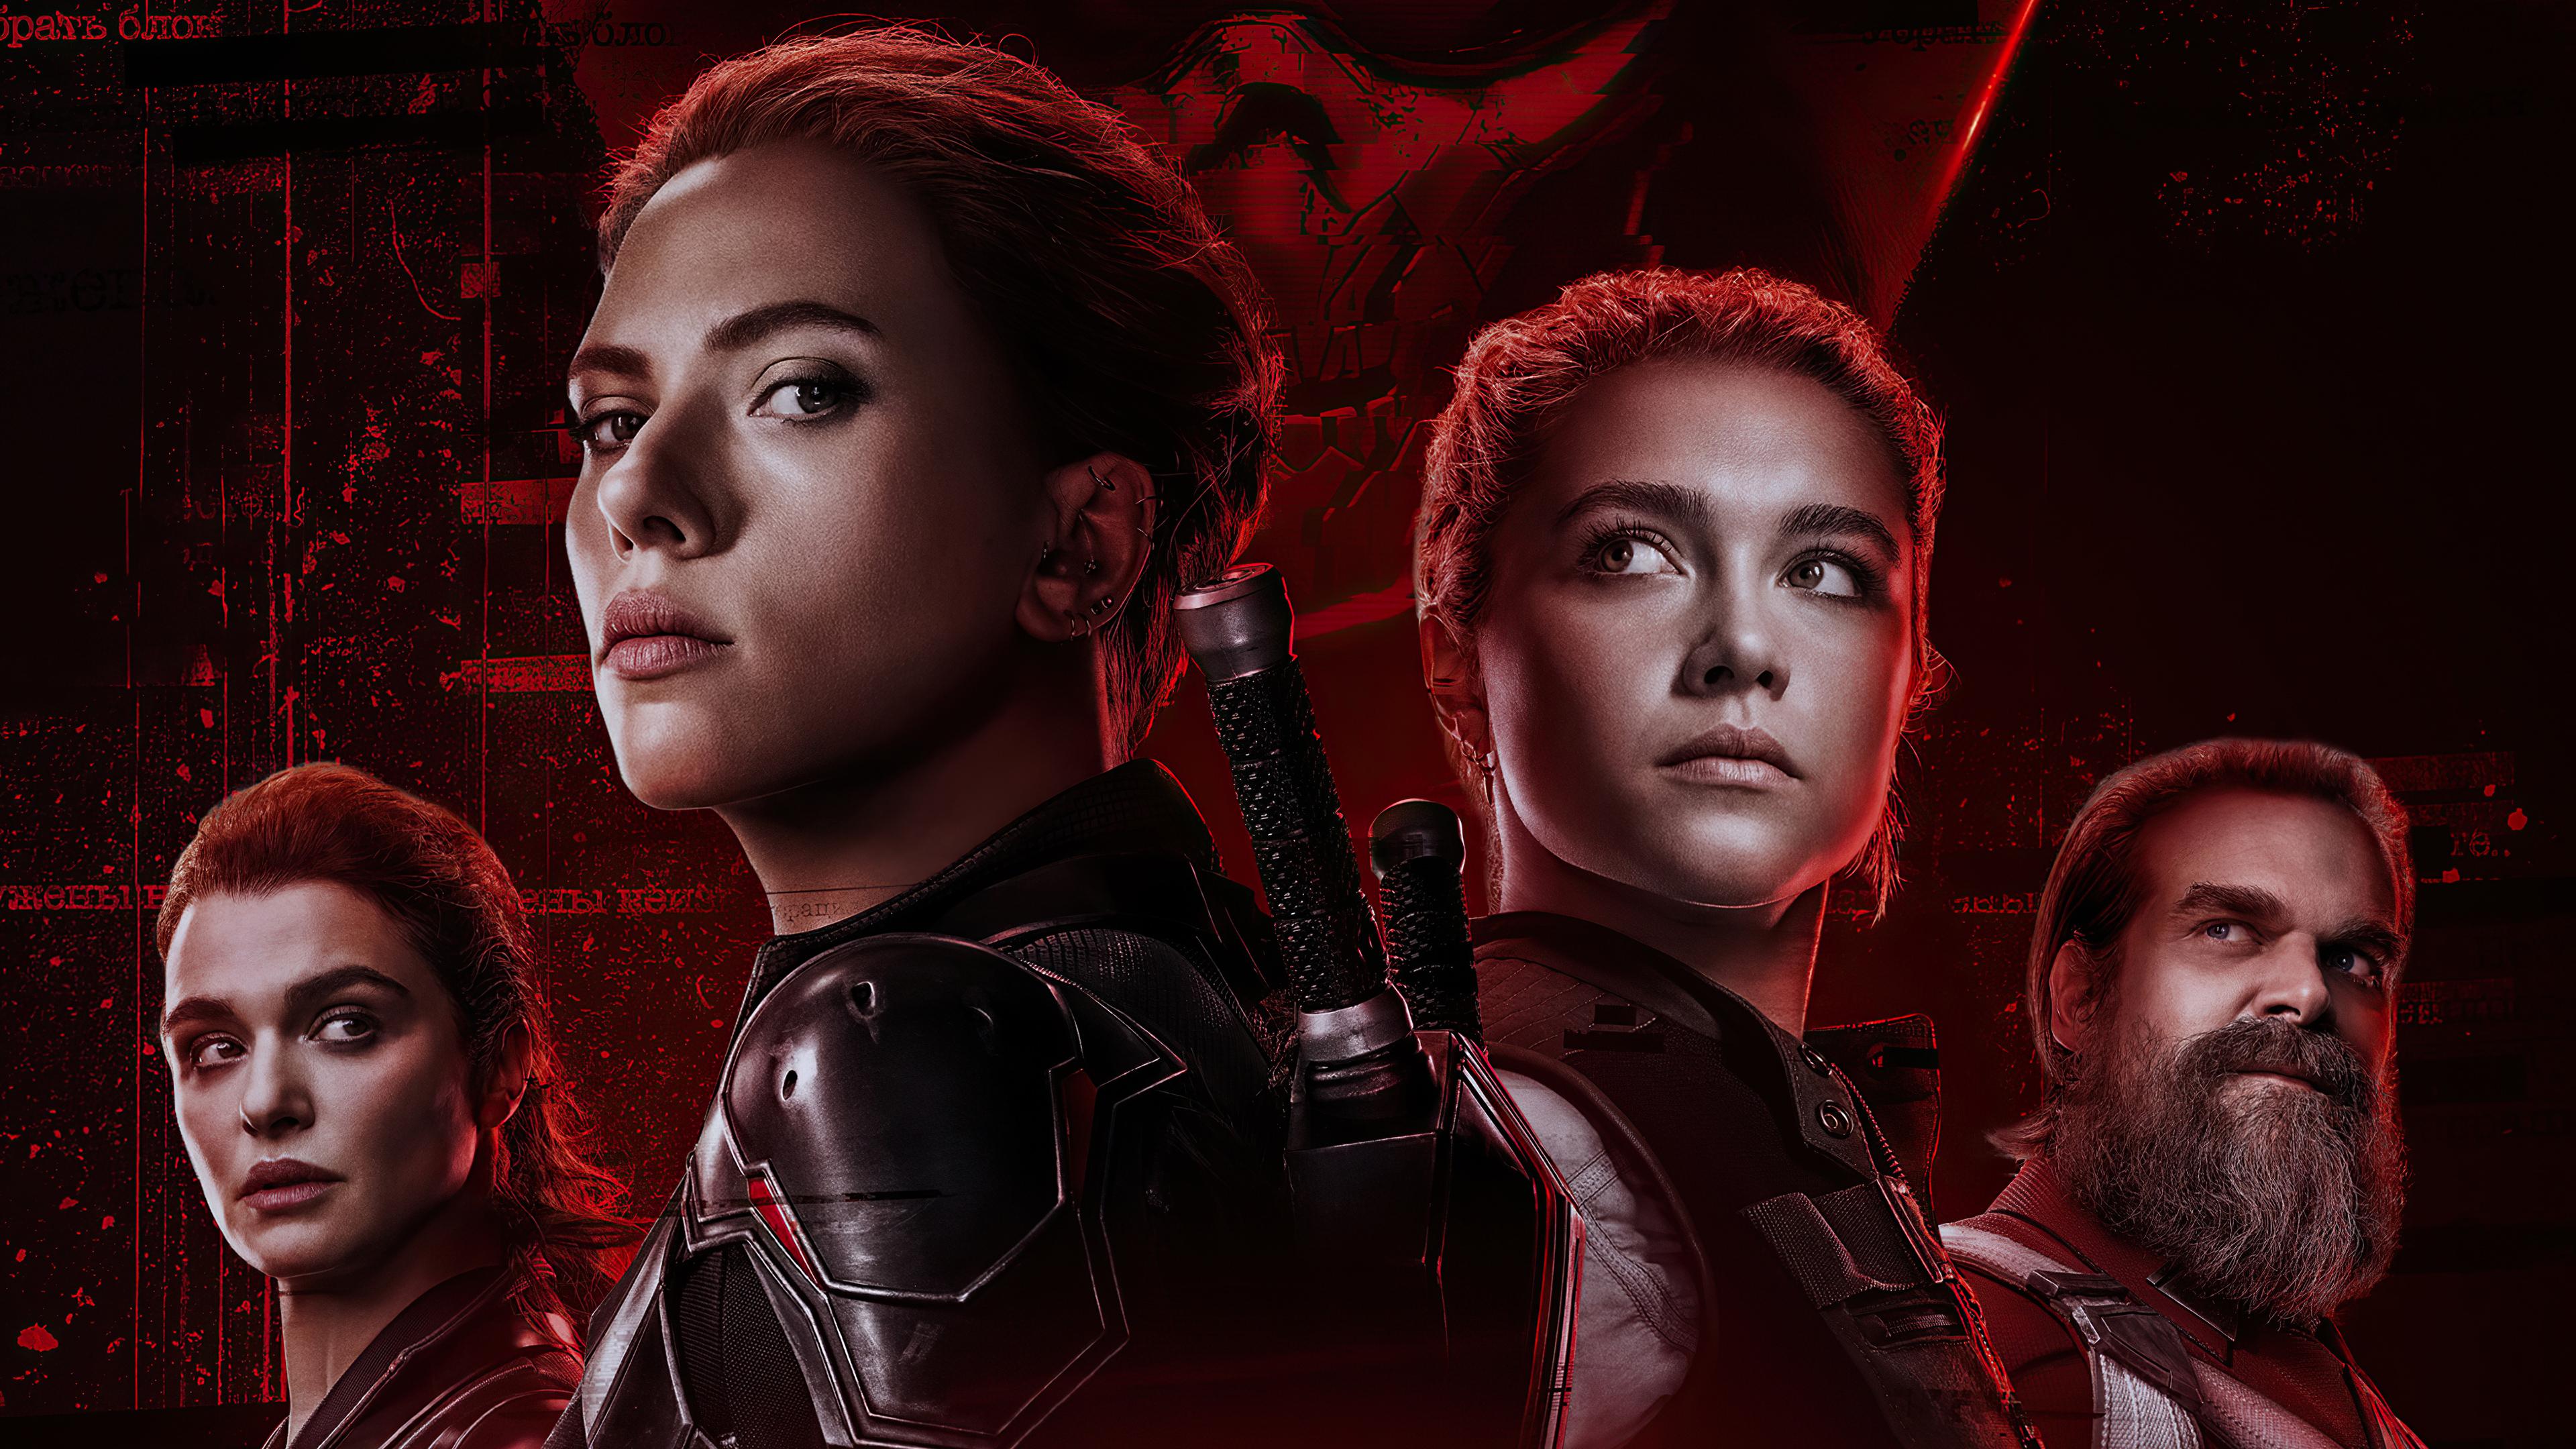 black widow movie 2021 4k 1618166500 - Black Widow Movie 2021 4k - Black Widow Movie 2021 4k wallpapers